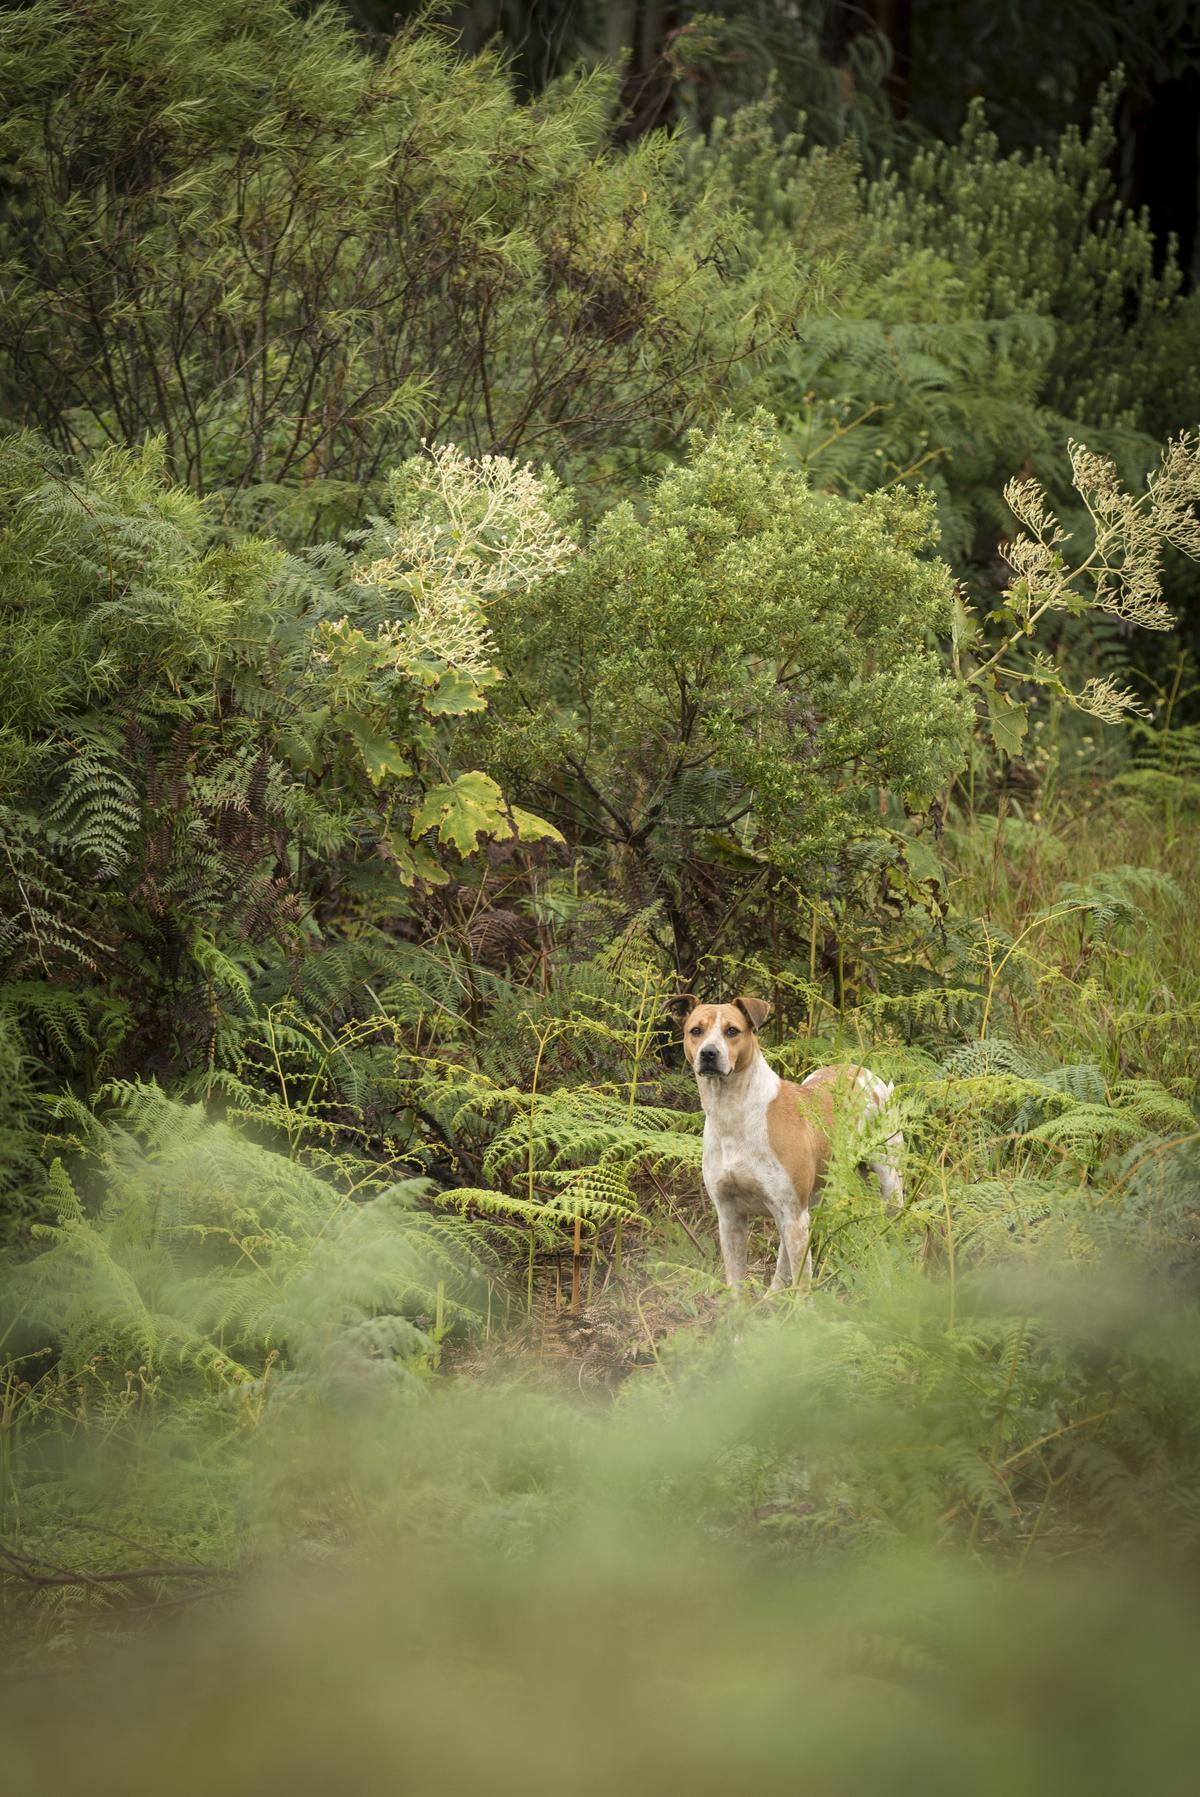 Dog Stands in Ferns